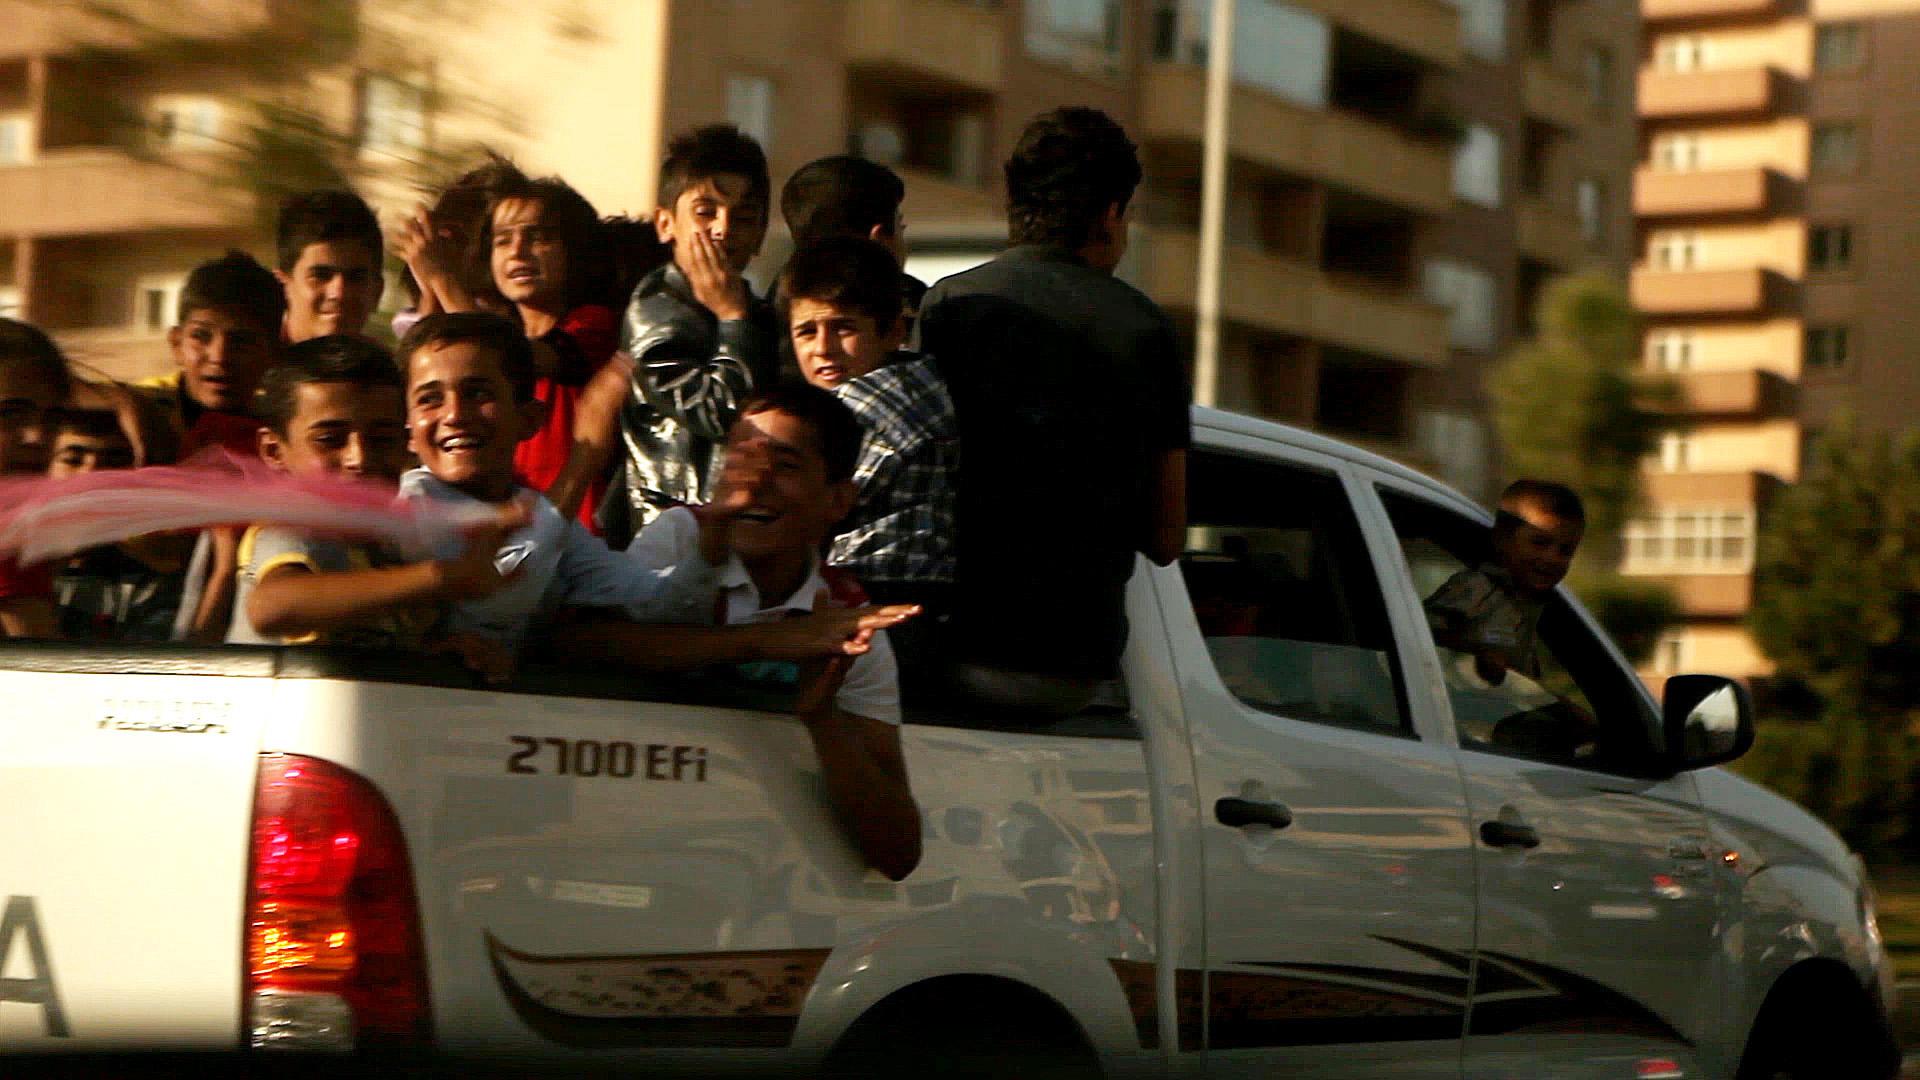 erbil-kurdistan-iraq-ute-party.jpg